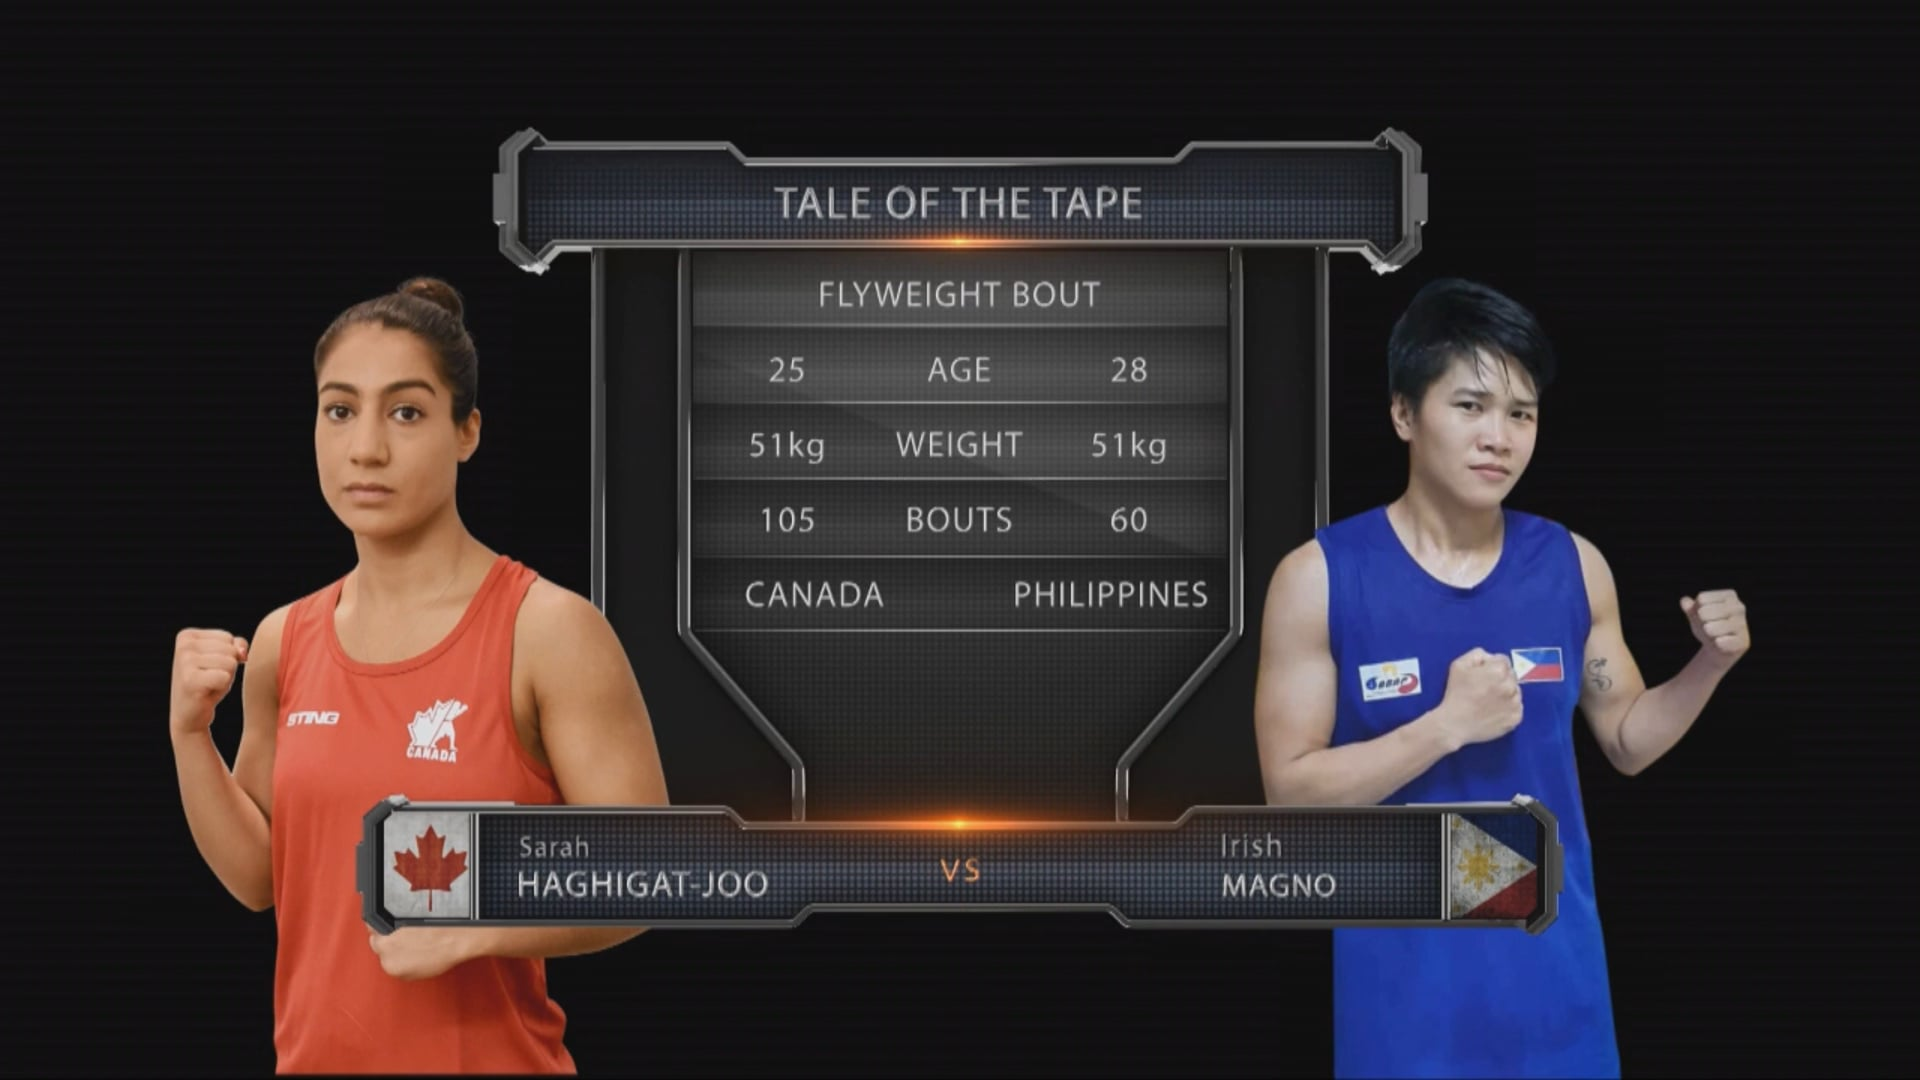 Sarah Haghigat-Joo (CAN) vs Irish Magno (PHL)